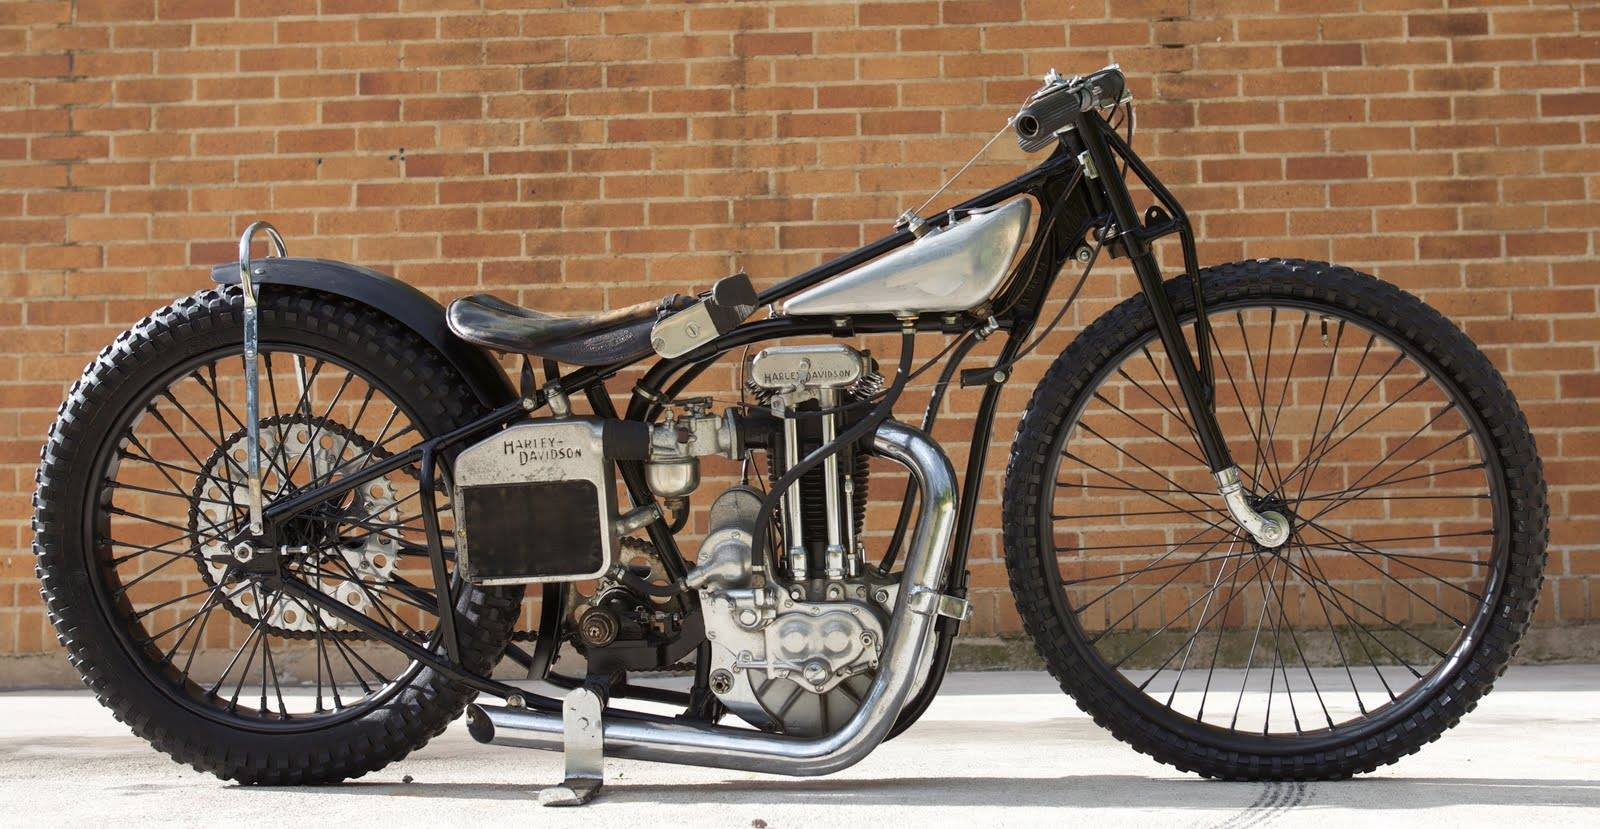 1928 Harley Davidson Ohv Peashooter: Mototique: A Short History Of Harley-Davidson's Early OHV